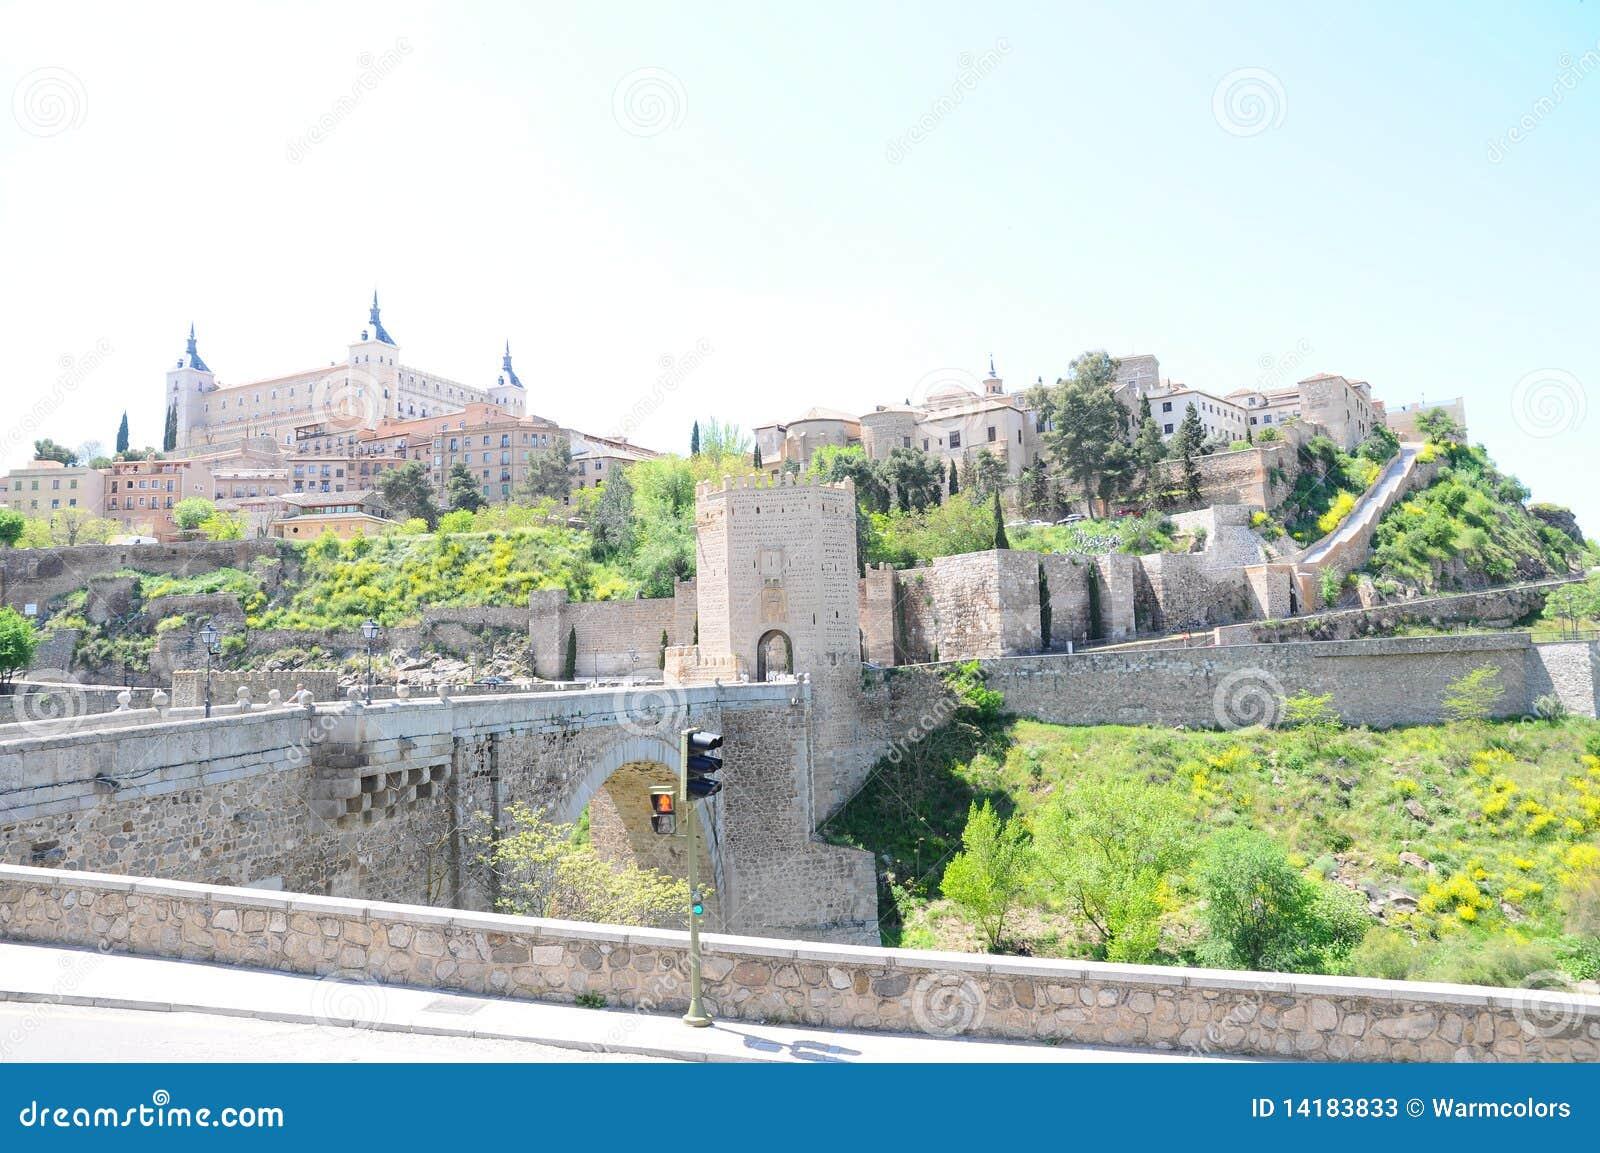 Old City Of Toledo Stock Photos - Image: 14183833